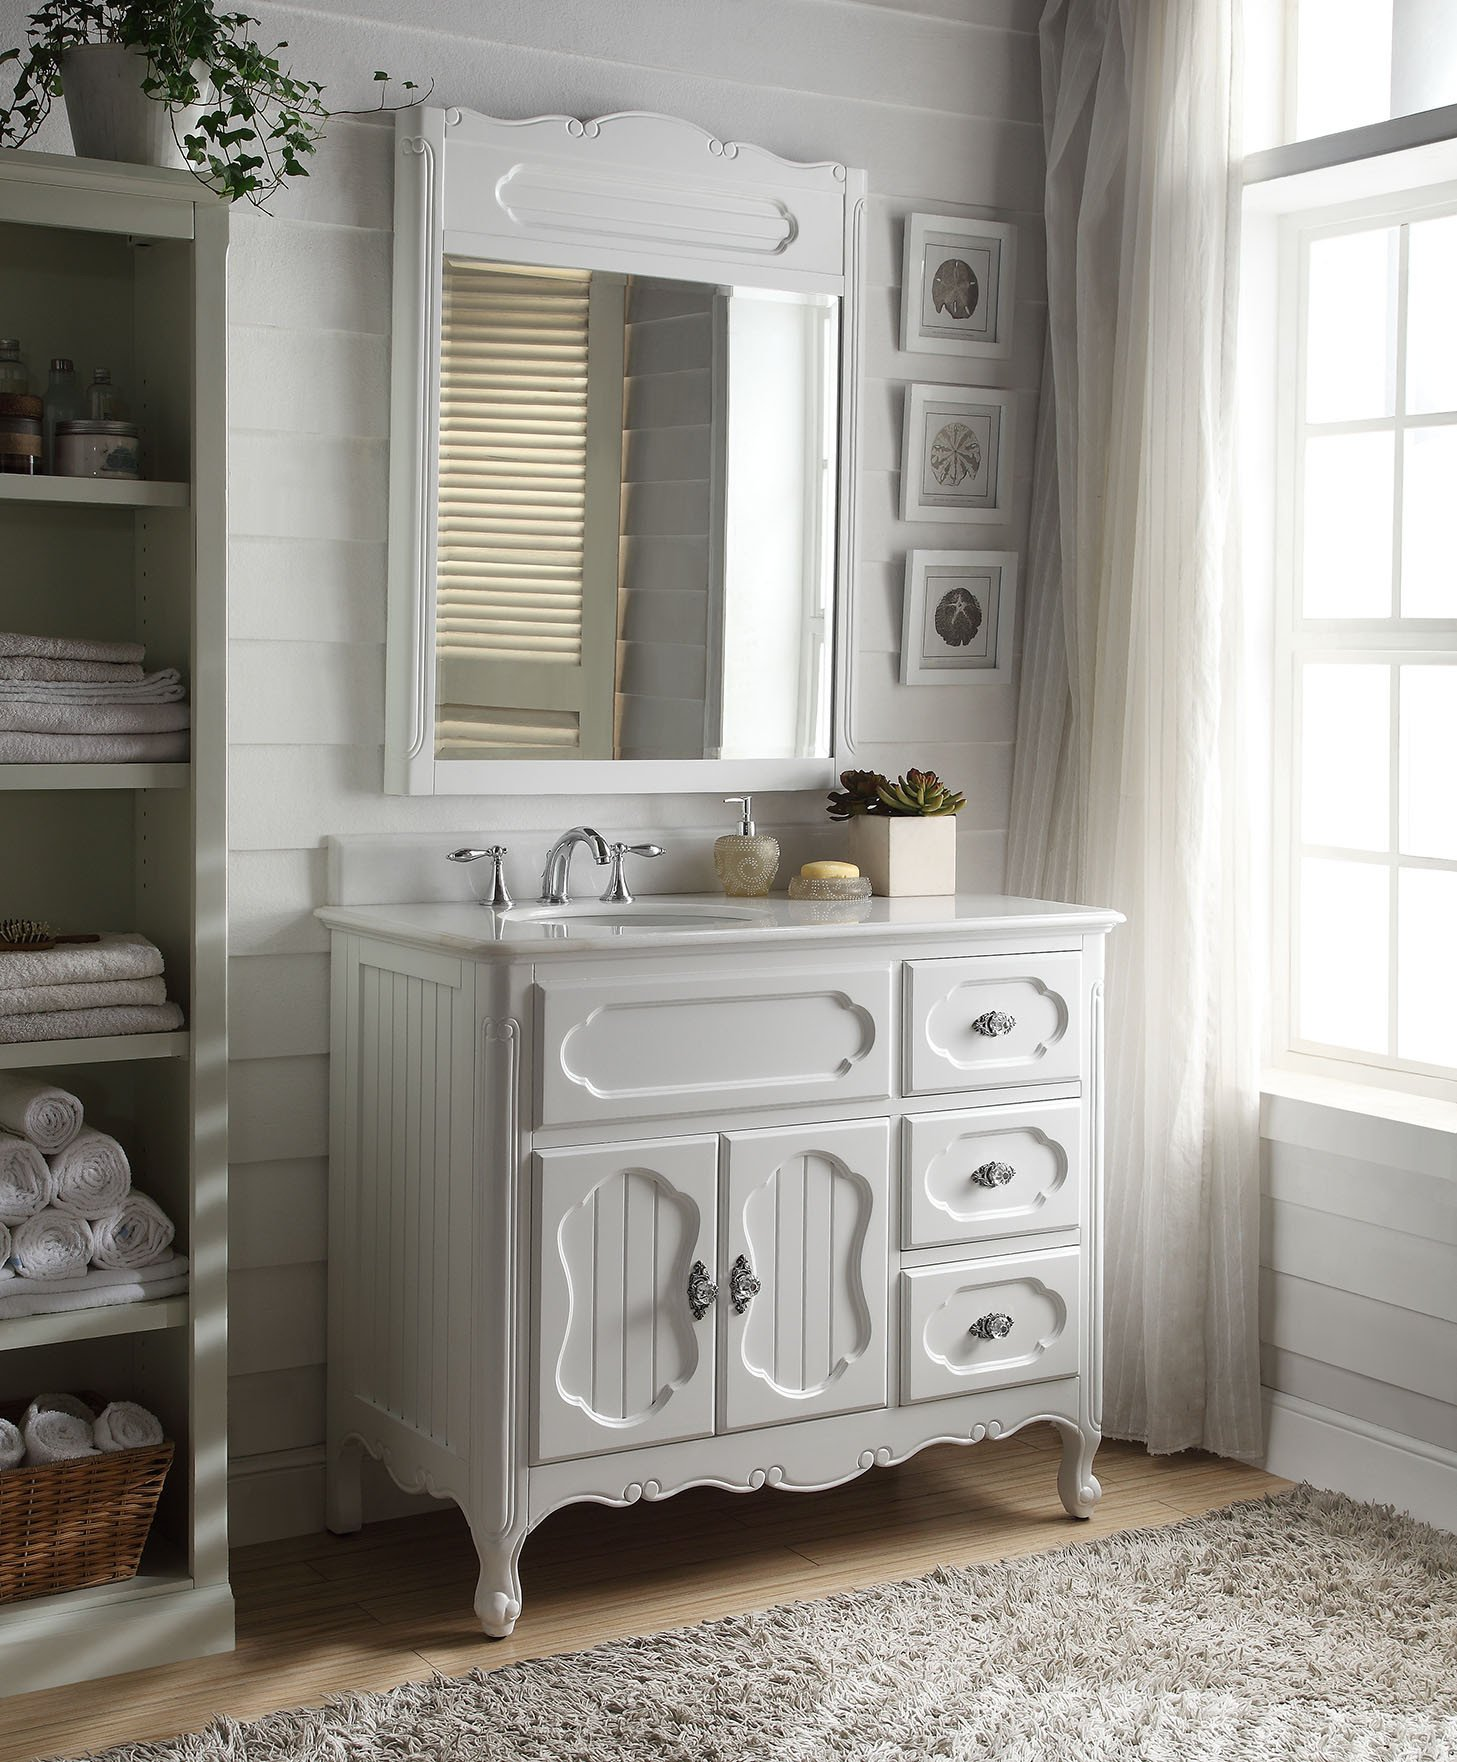 42 Benton Collection Knoxville White Victorian Bathroom Vanity With Mirror Gd 1509w 42 Bs Mir Walmart Com Walmart Com